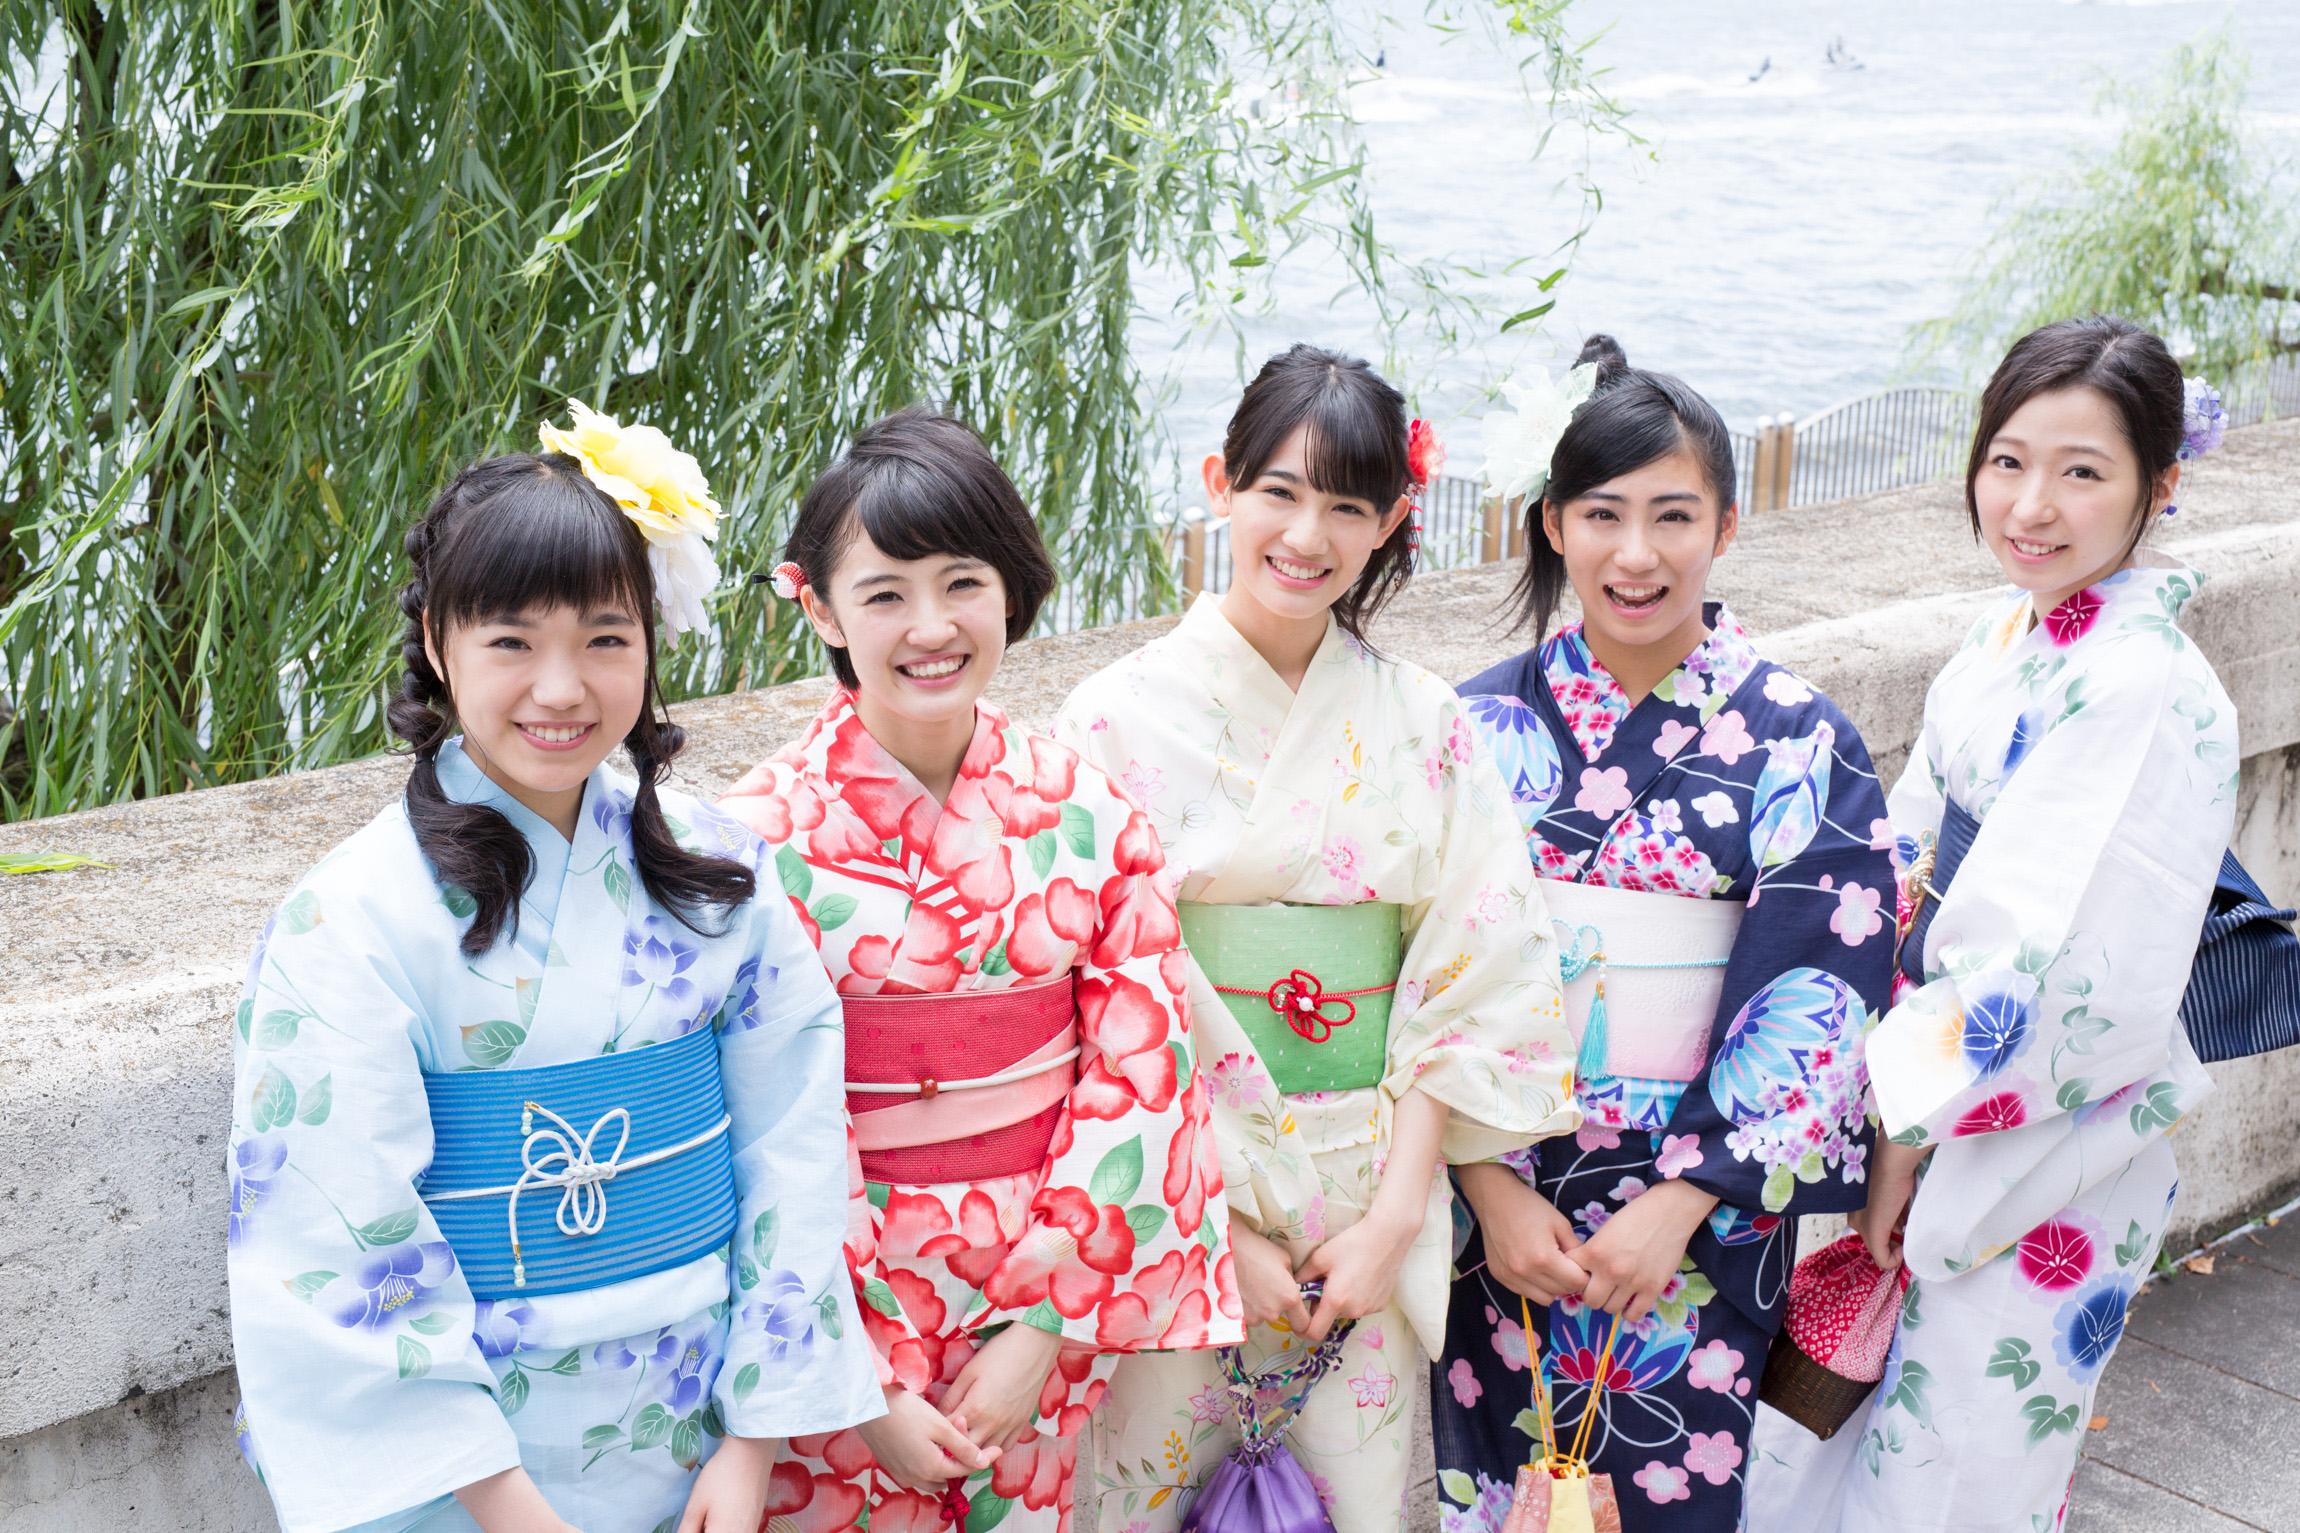 20160831_teamsyachihoko01_offshot_toukou